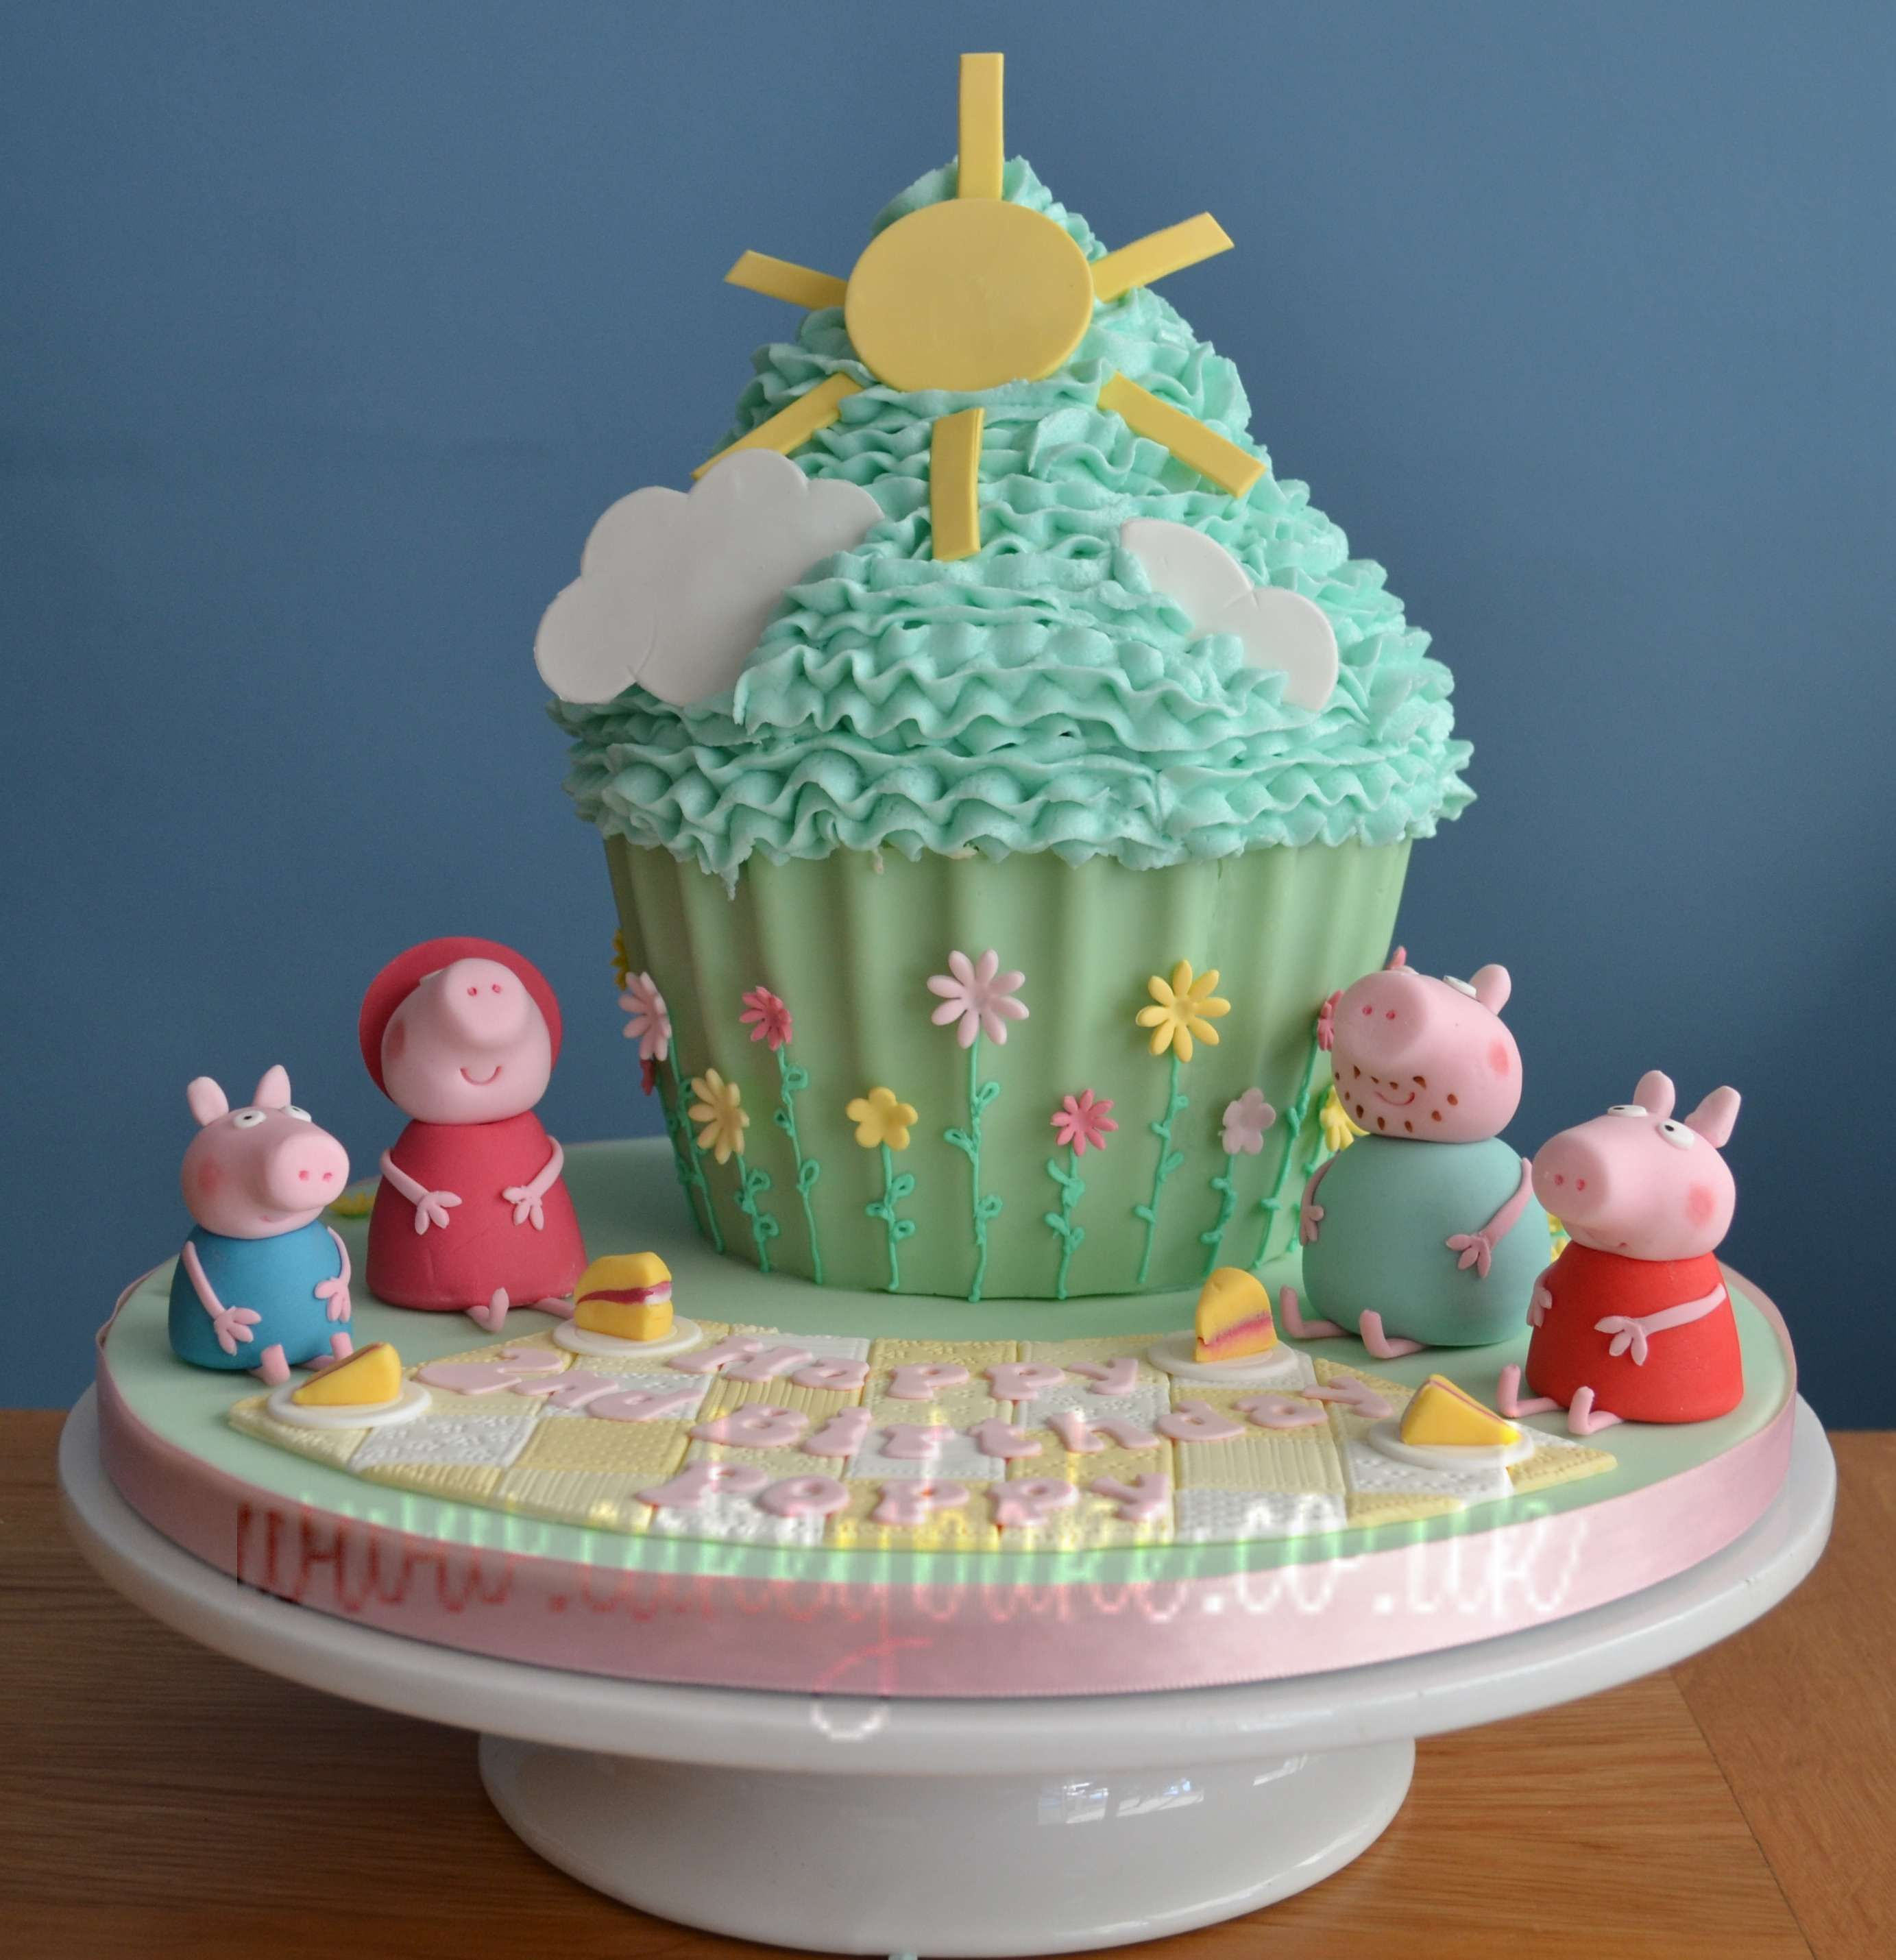 Peppa Pig Birthday Cake by Kirsty Low Shirley Spencer wwwcakeybake